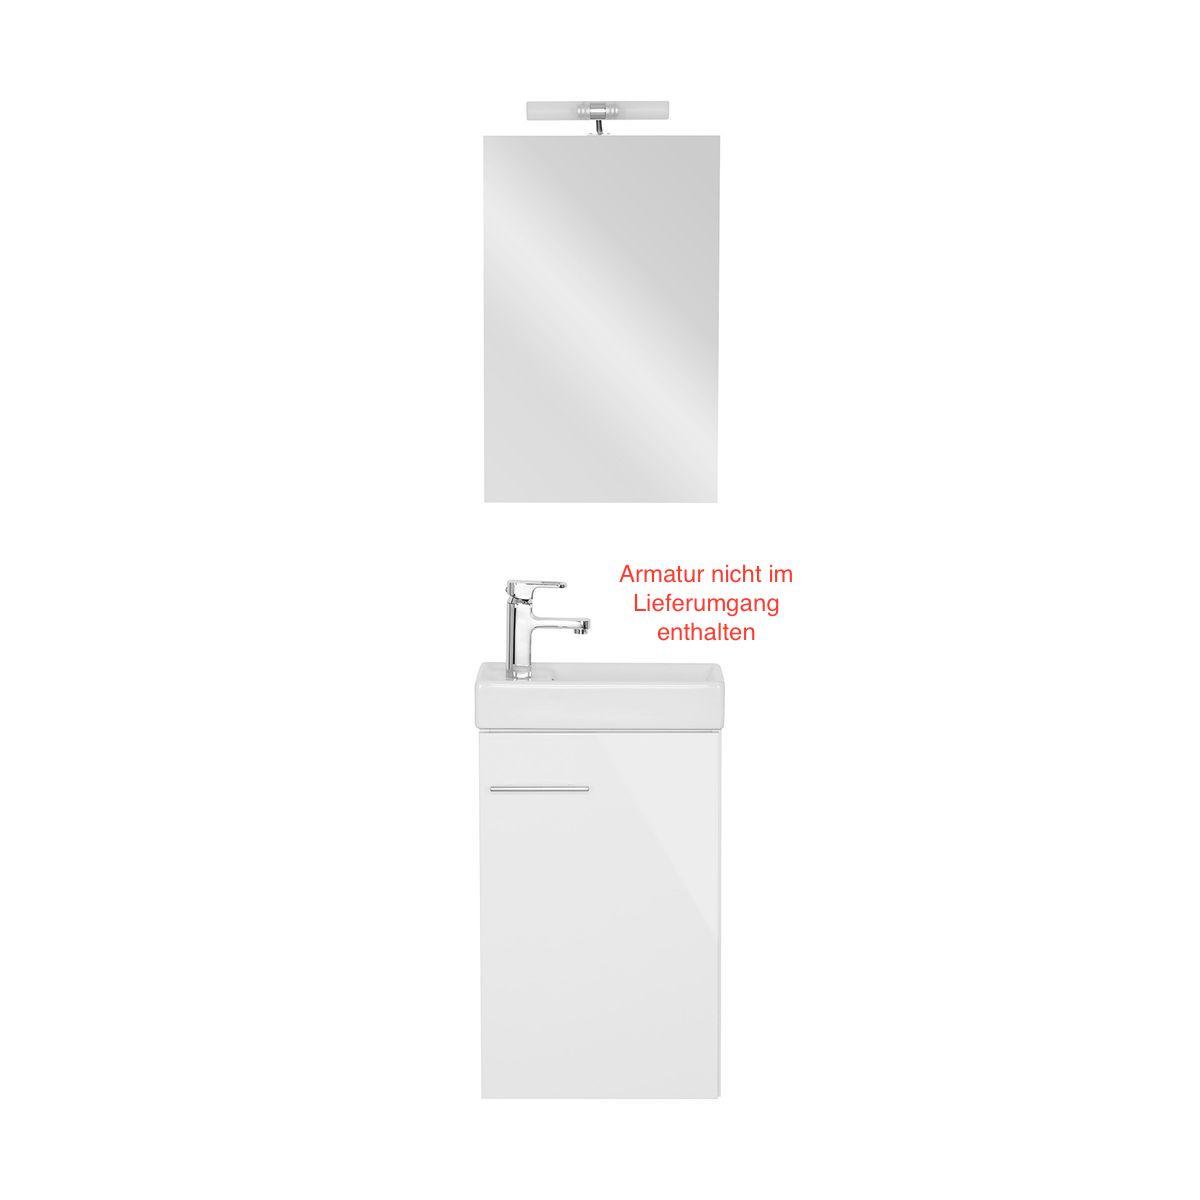 Gäste Bad-Set BOLOGNA Weiß – Bild 1